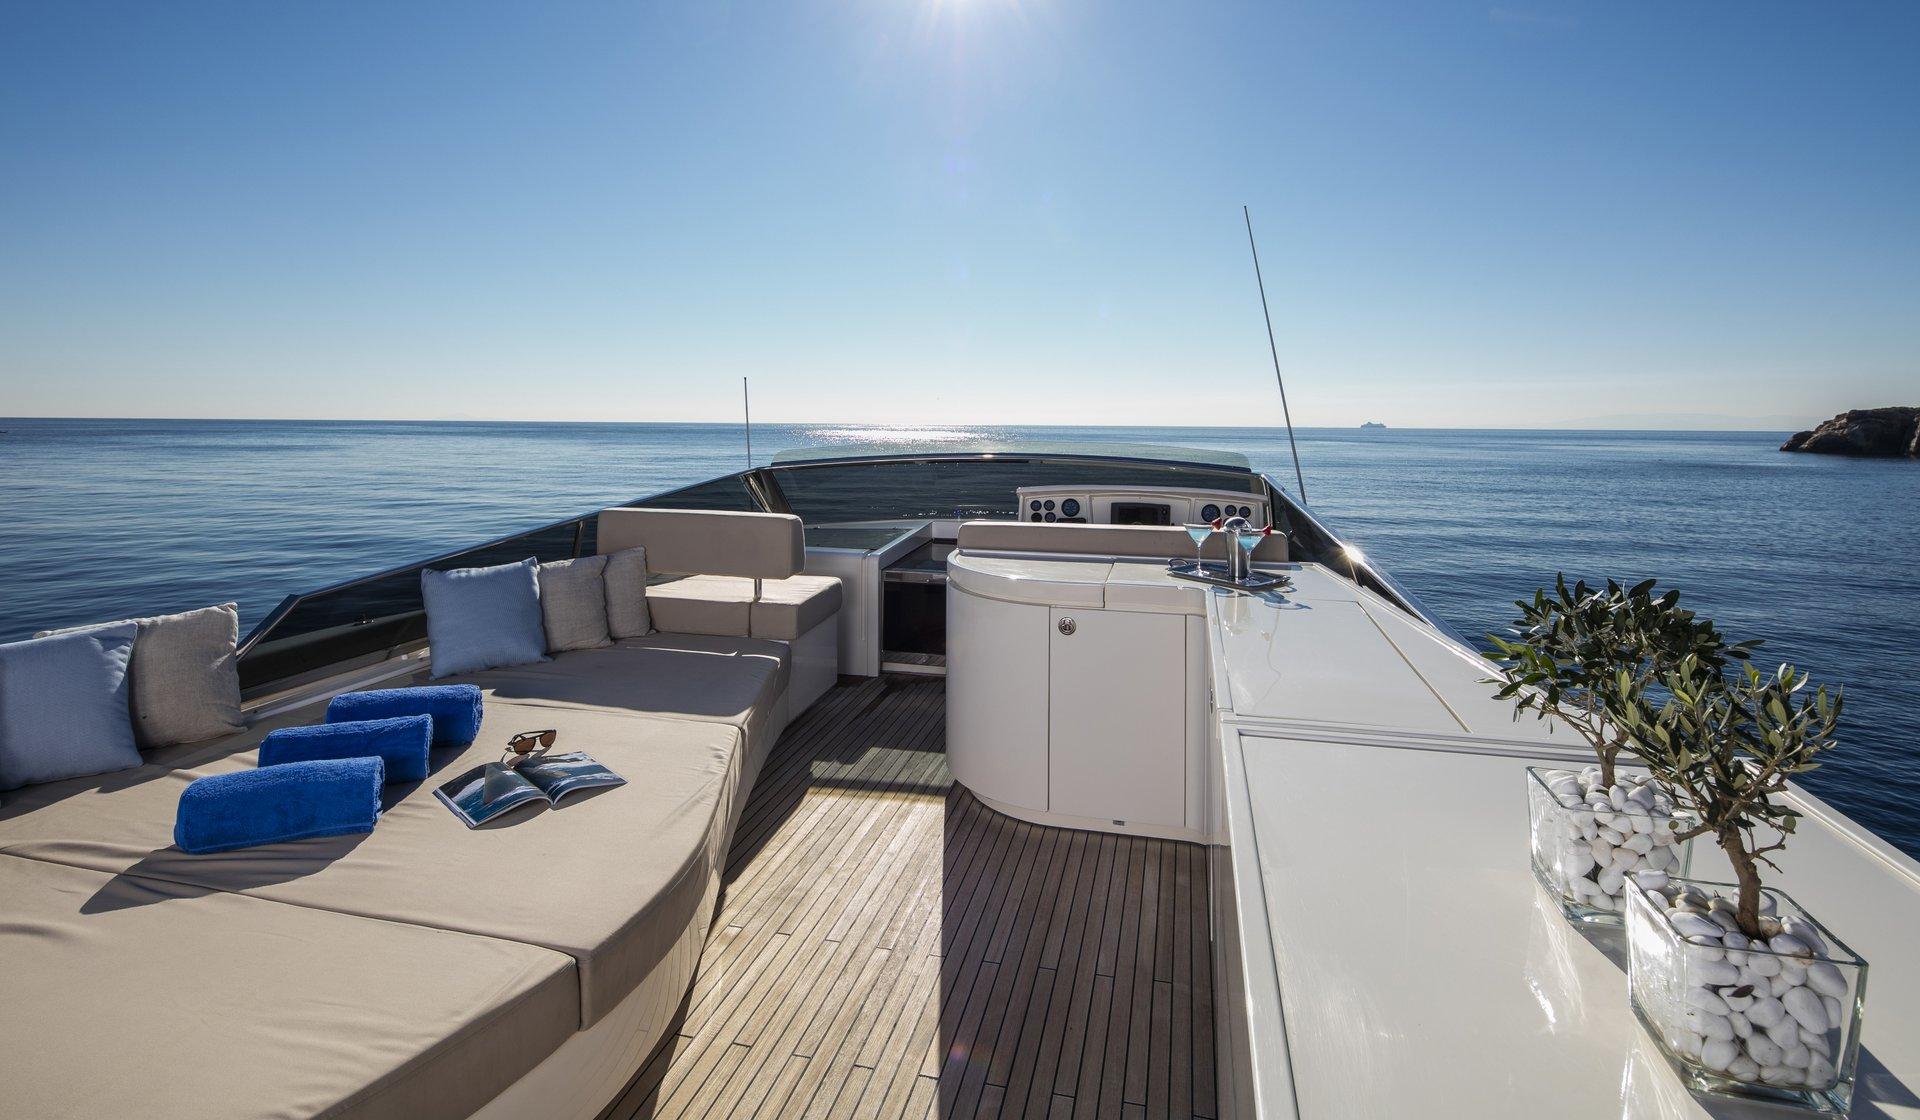 M/Y Mythos yacht for sale sundeck lounge